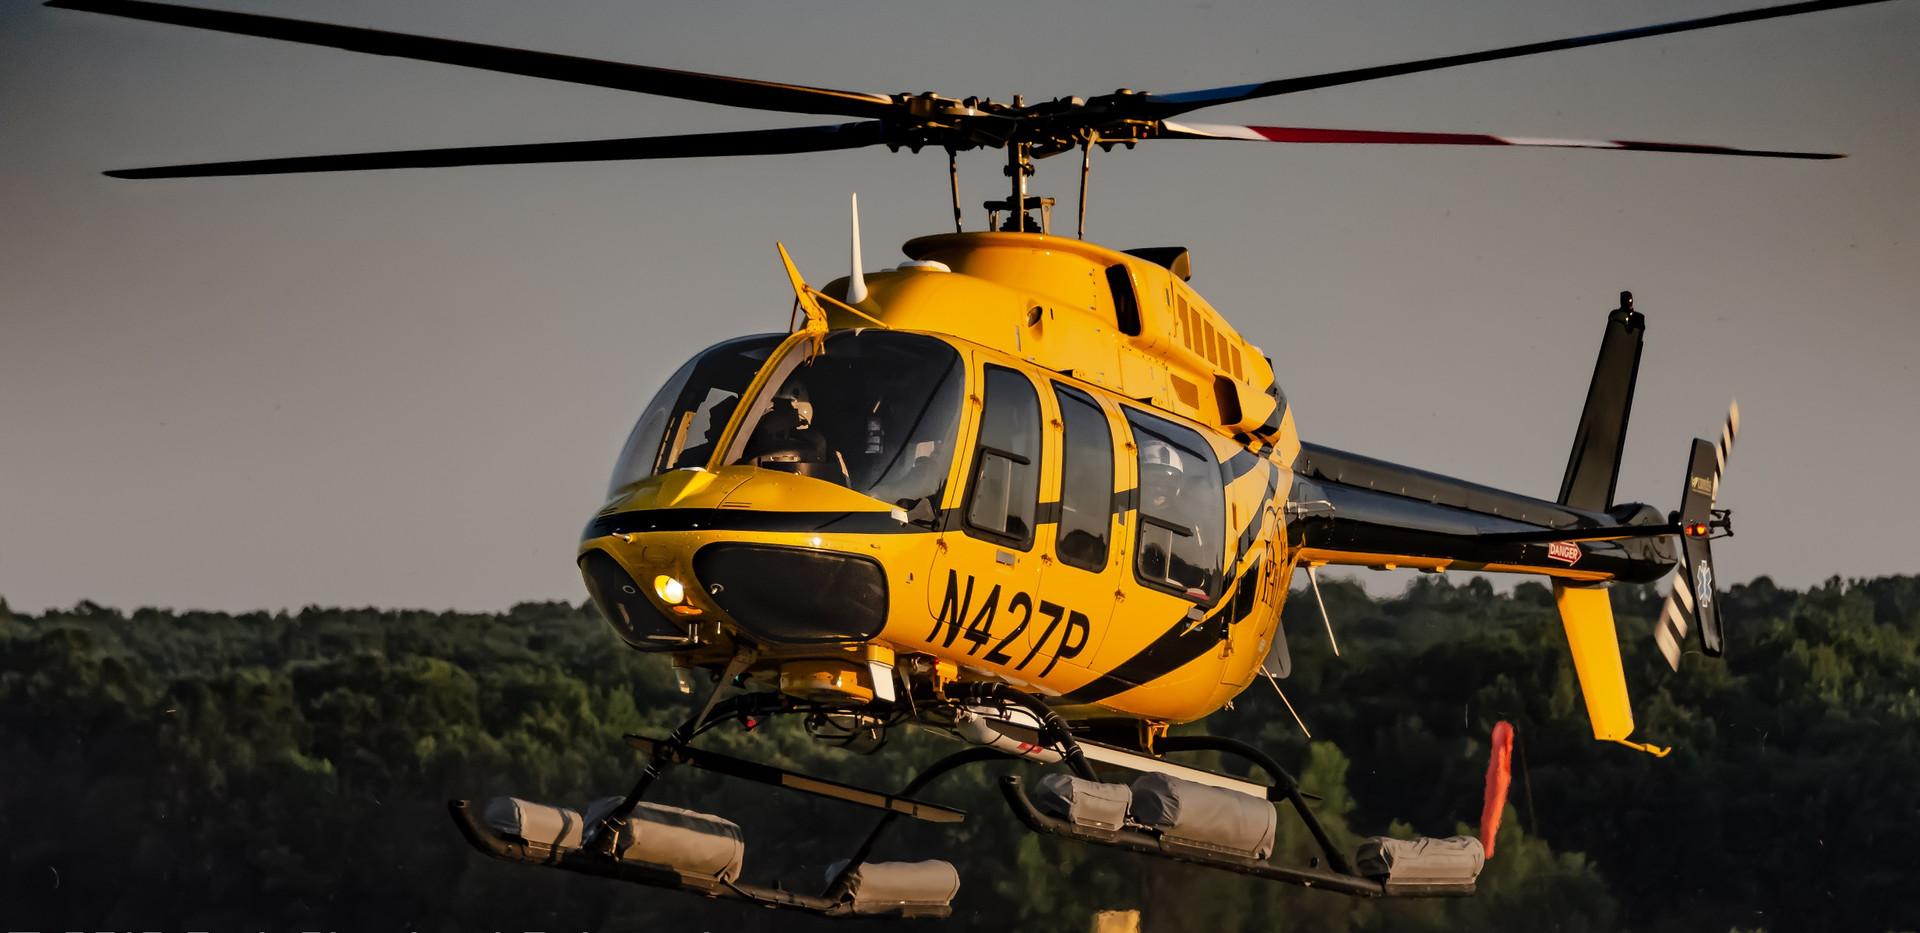 N427P lands at KEZF